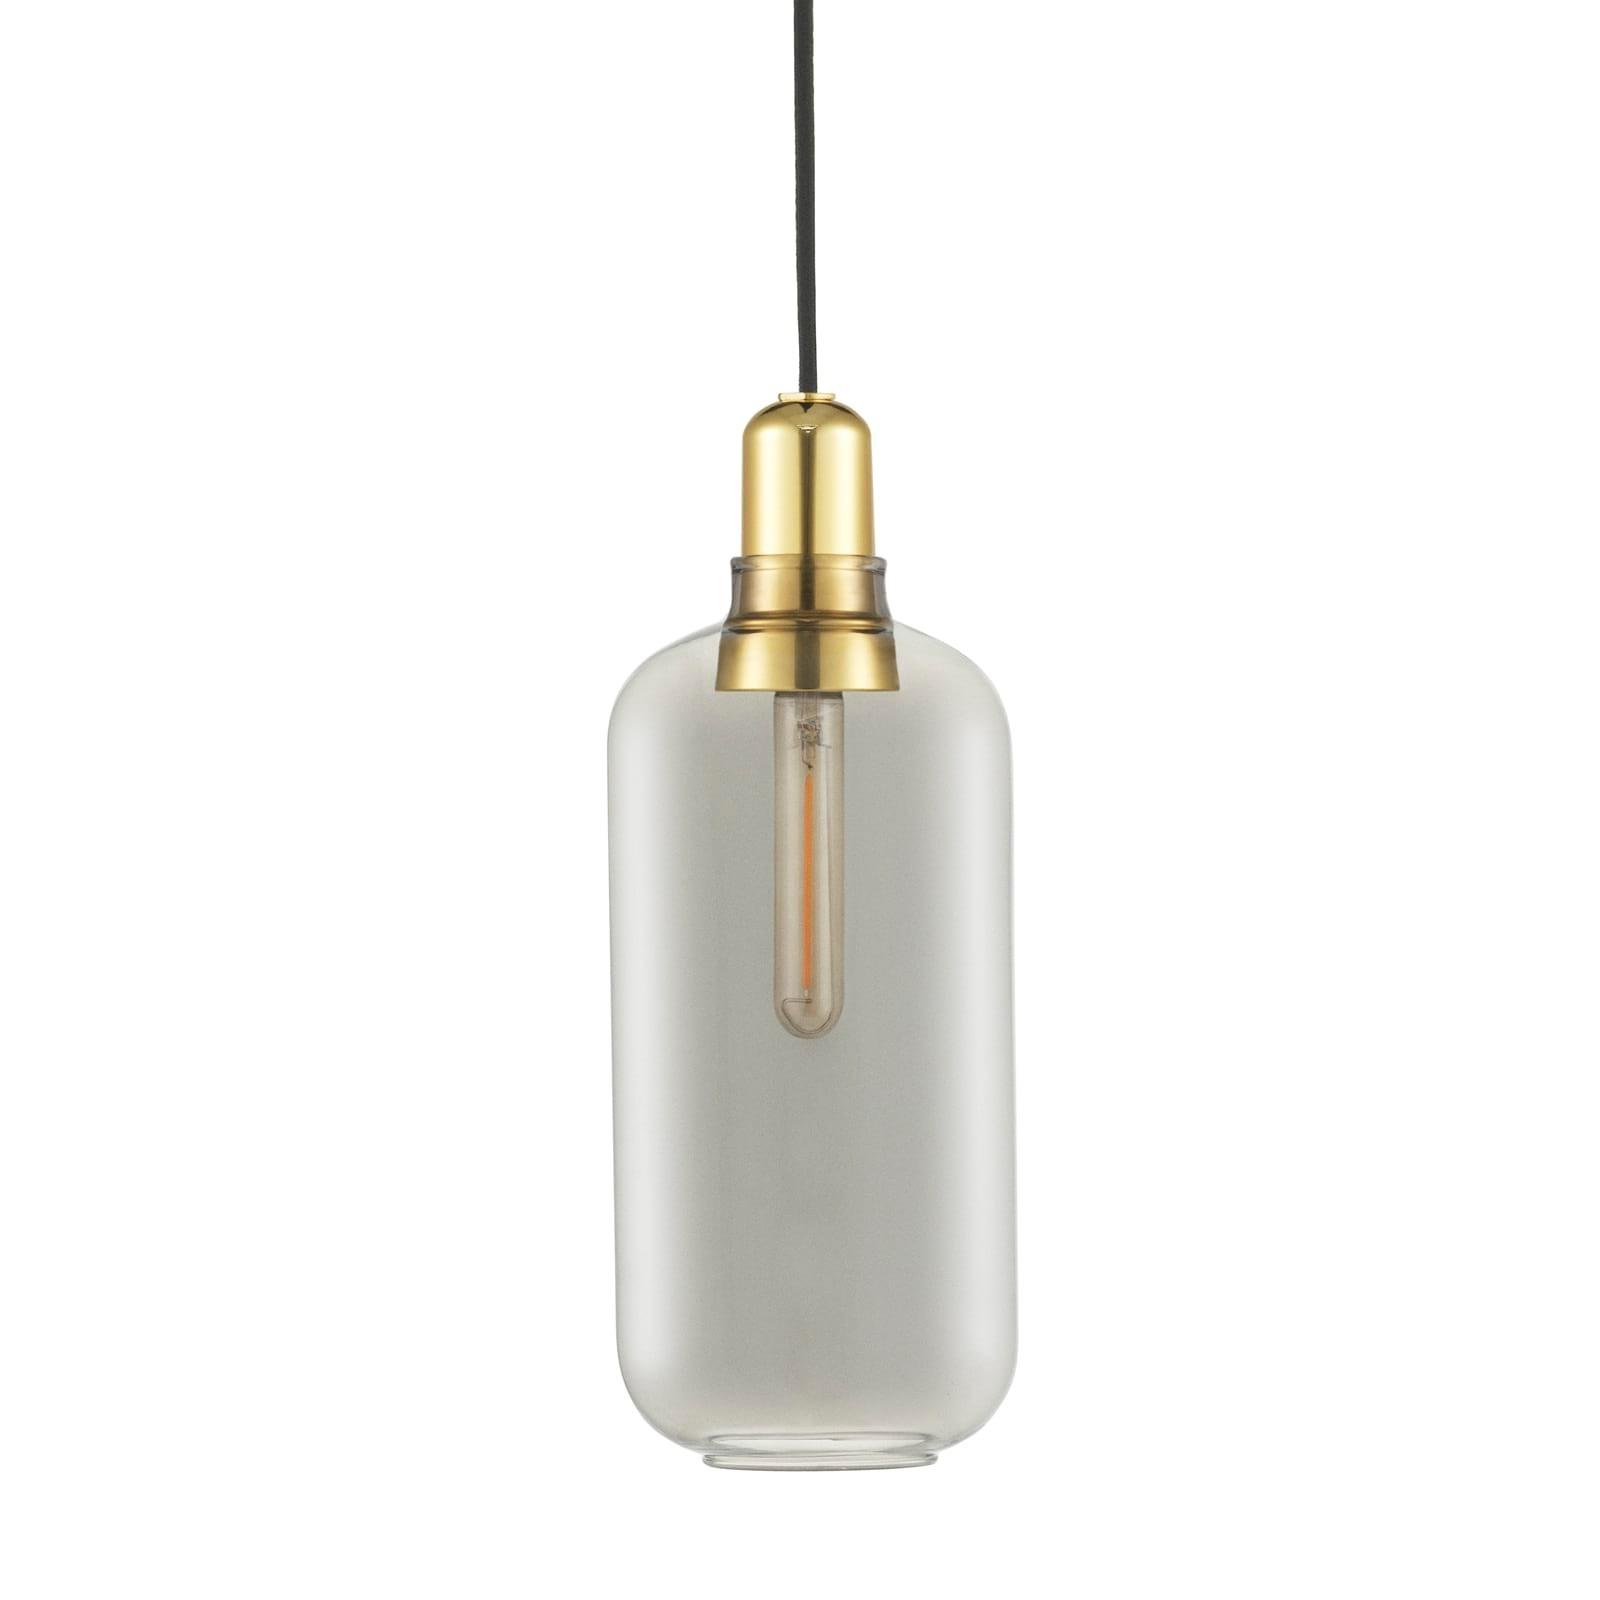 Amp Lamp Large (Smoke / Brass) - Normann Copenhagen